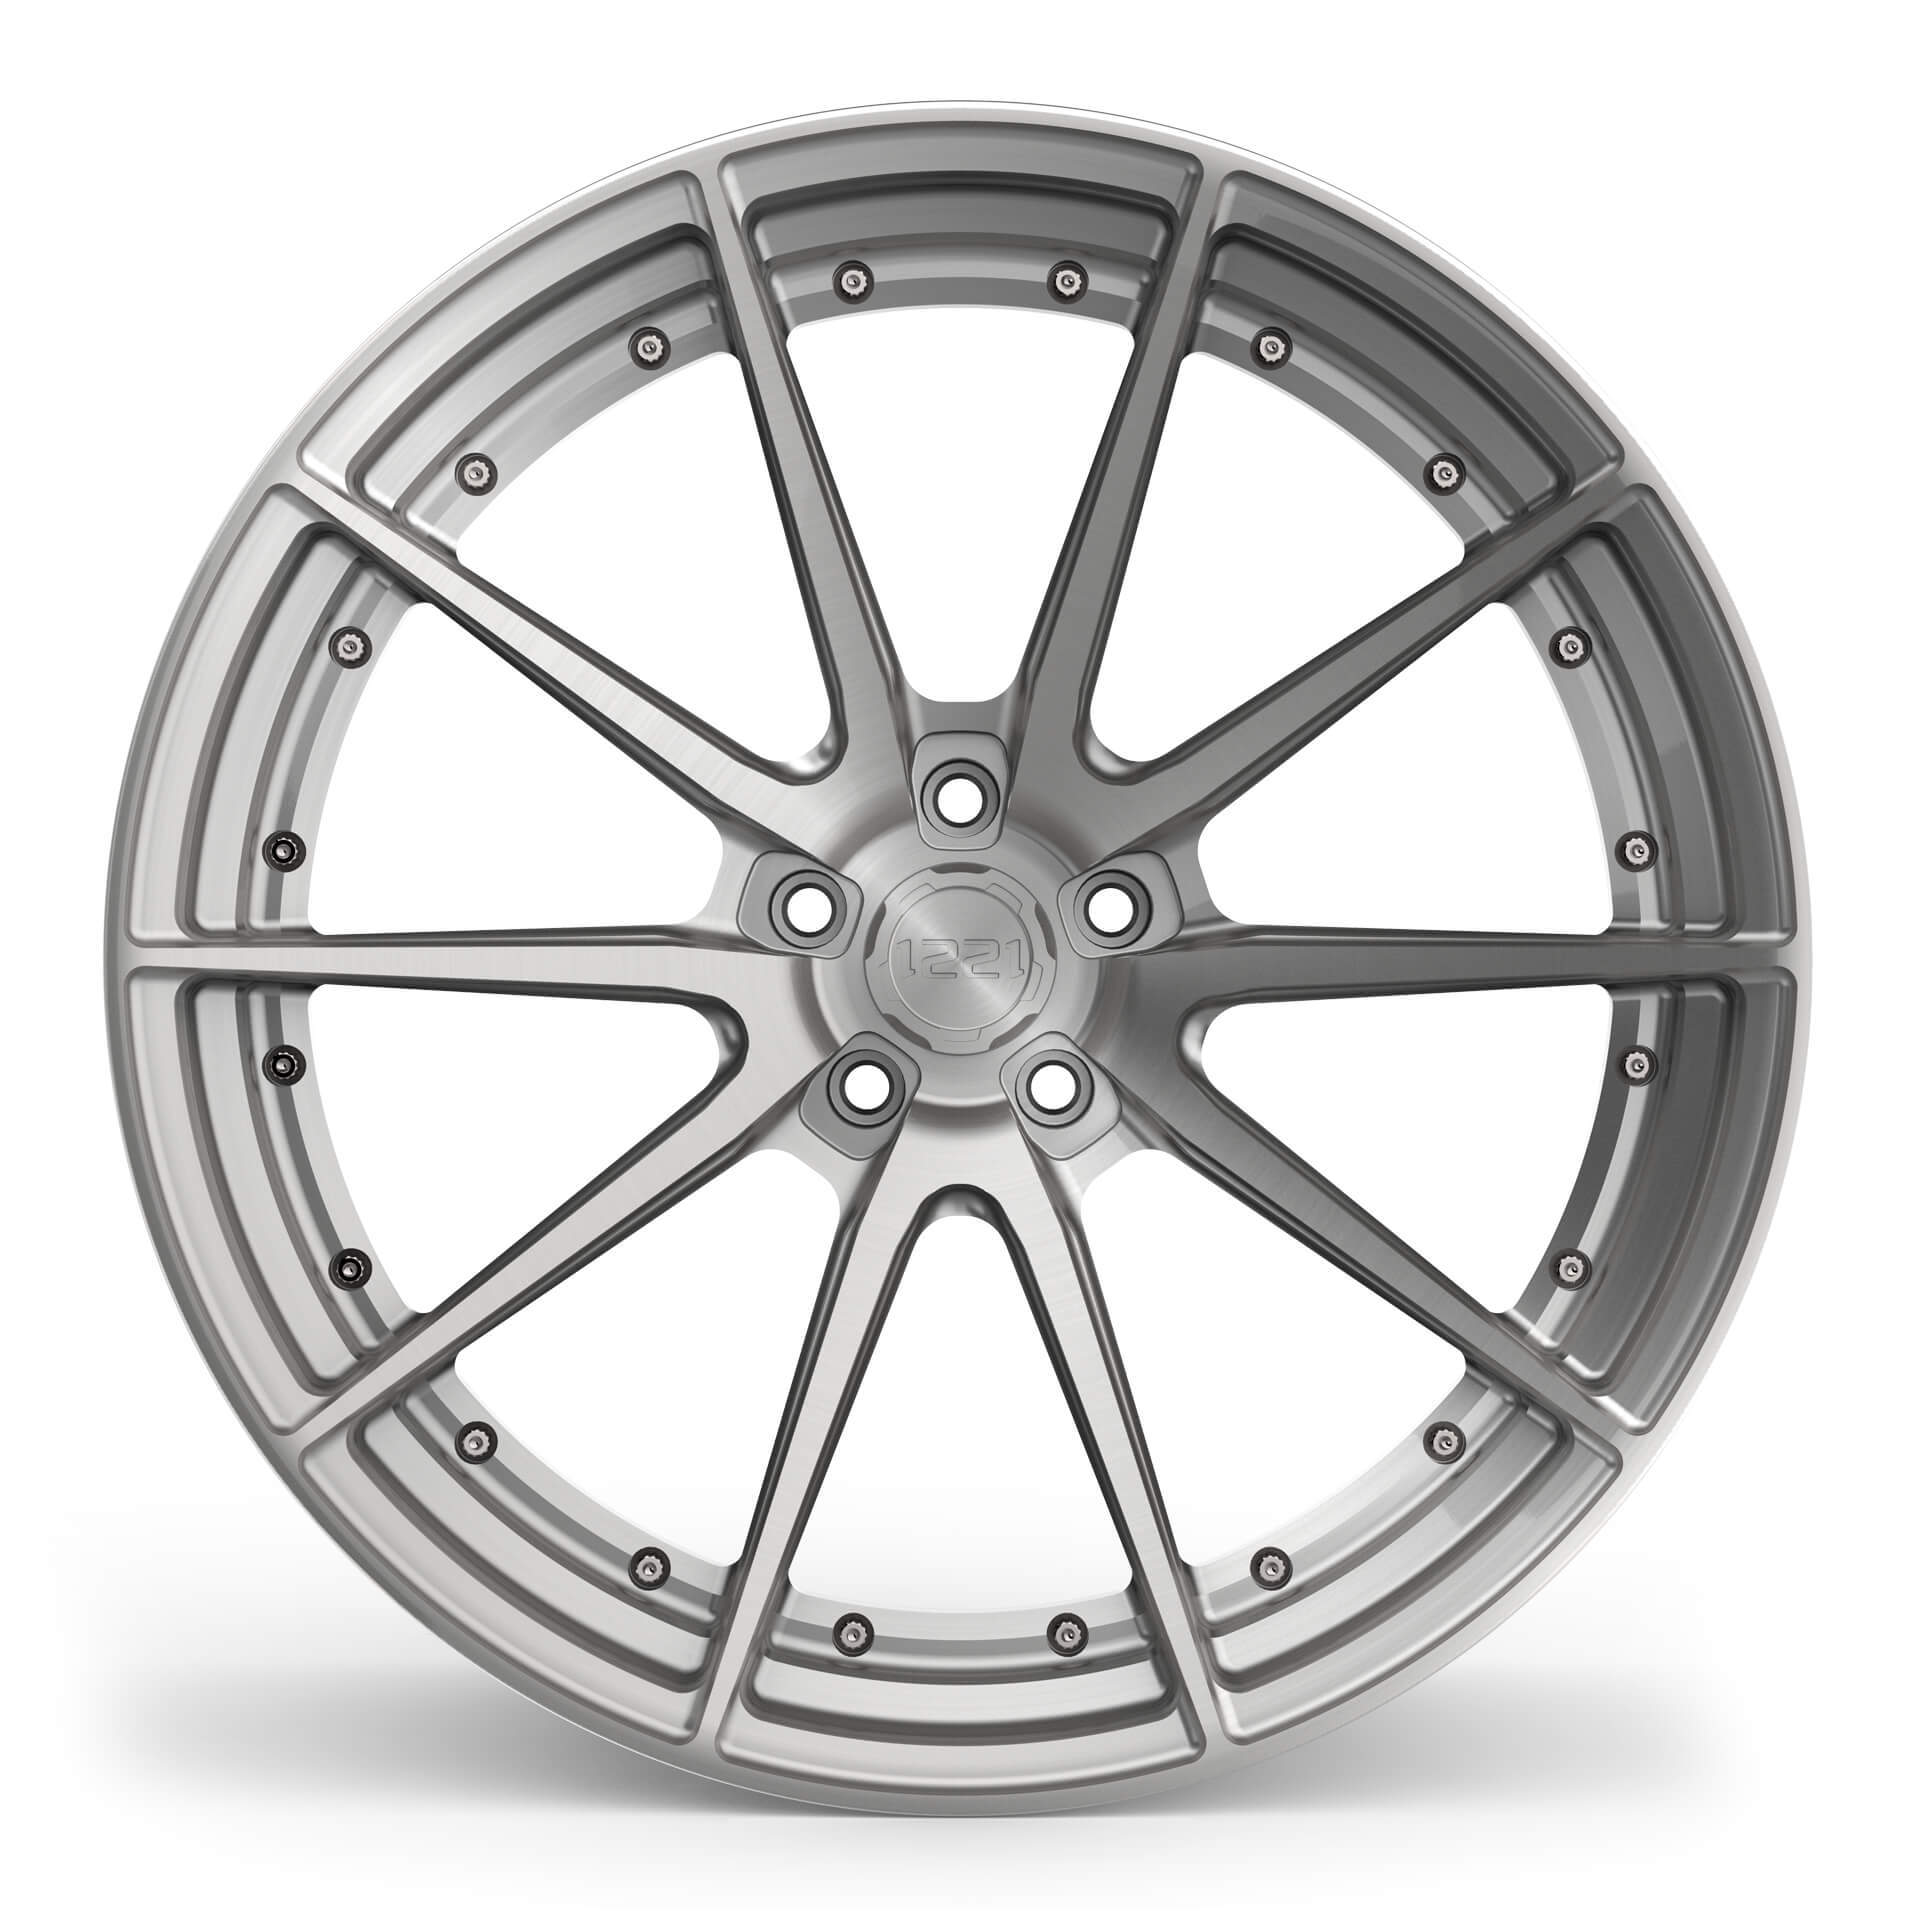 1221  Wheels  0110 AP2 SPORT3.0 forged wheels